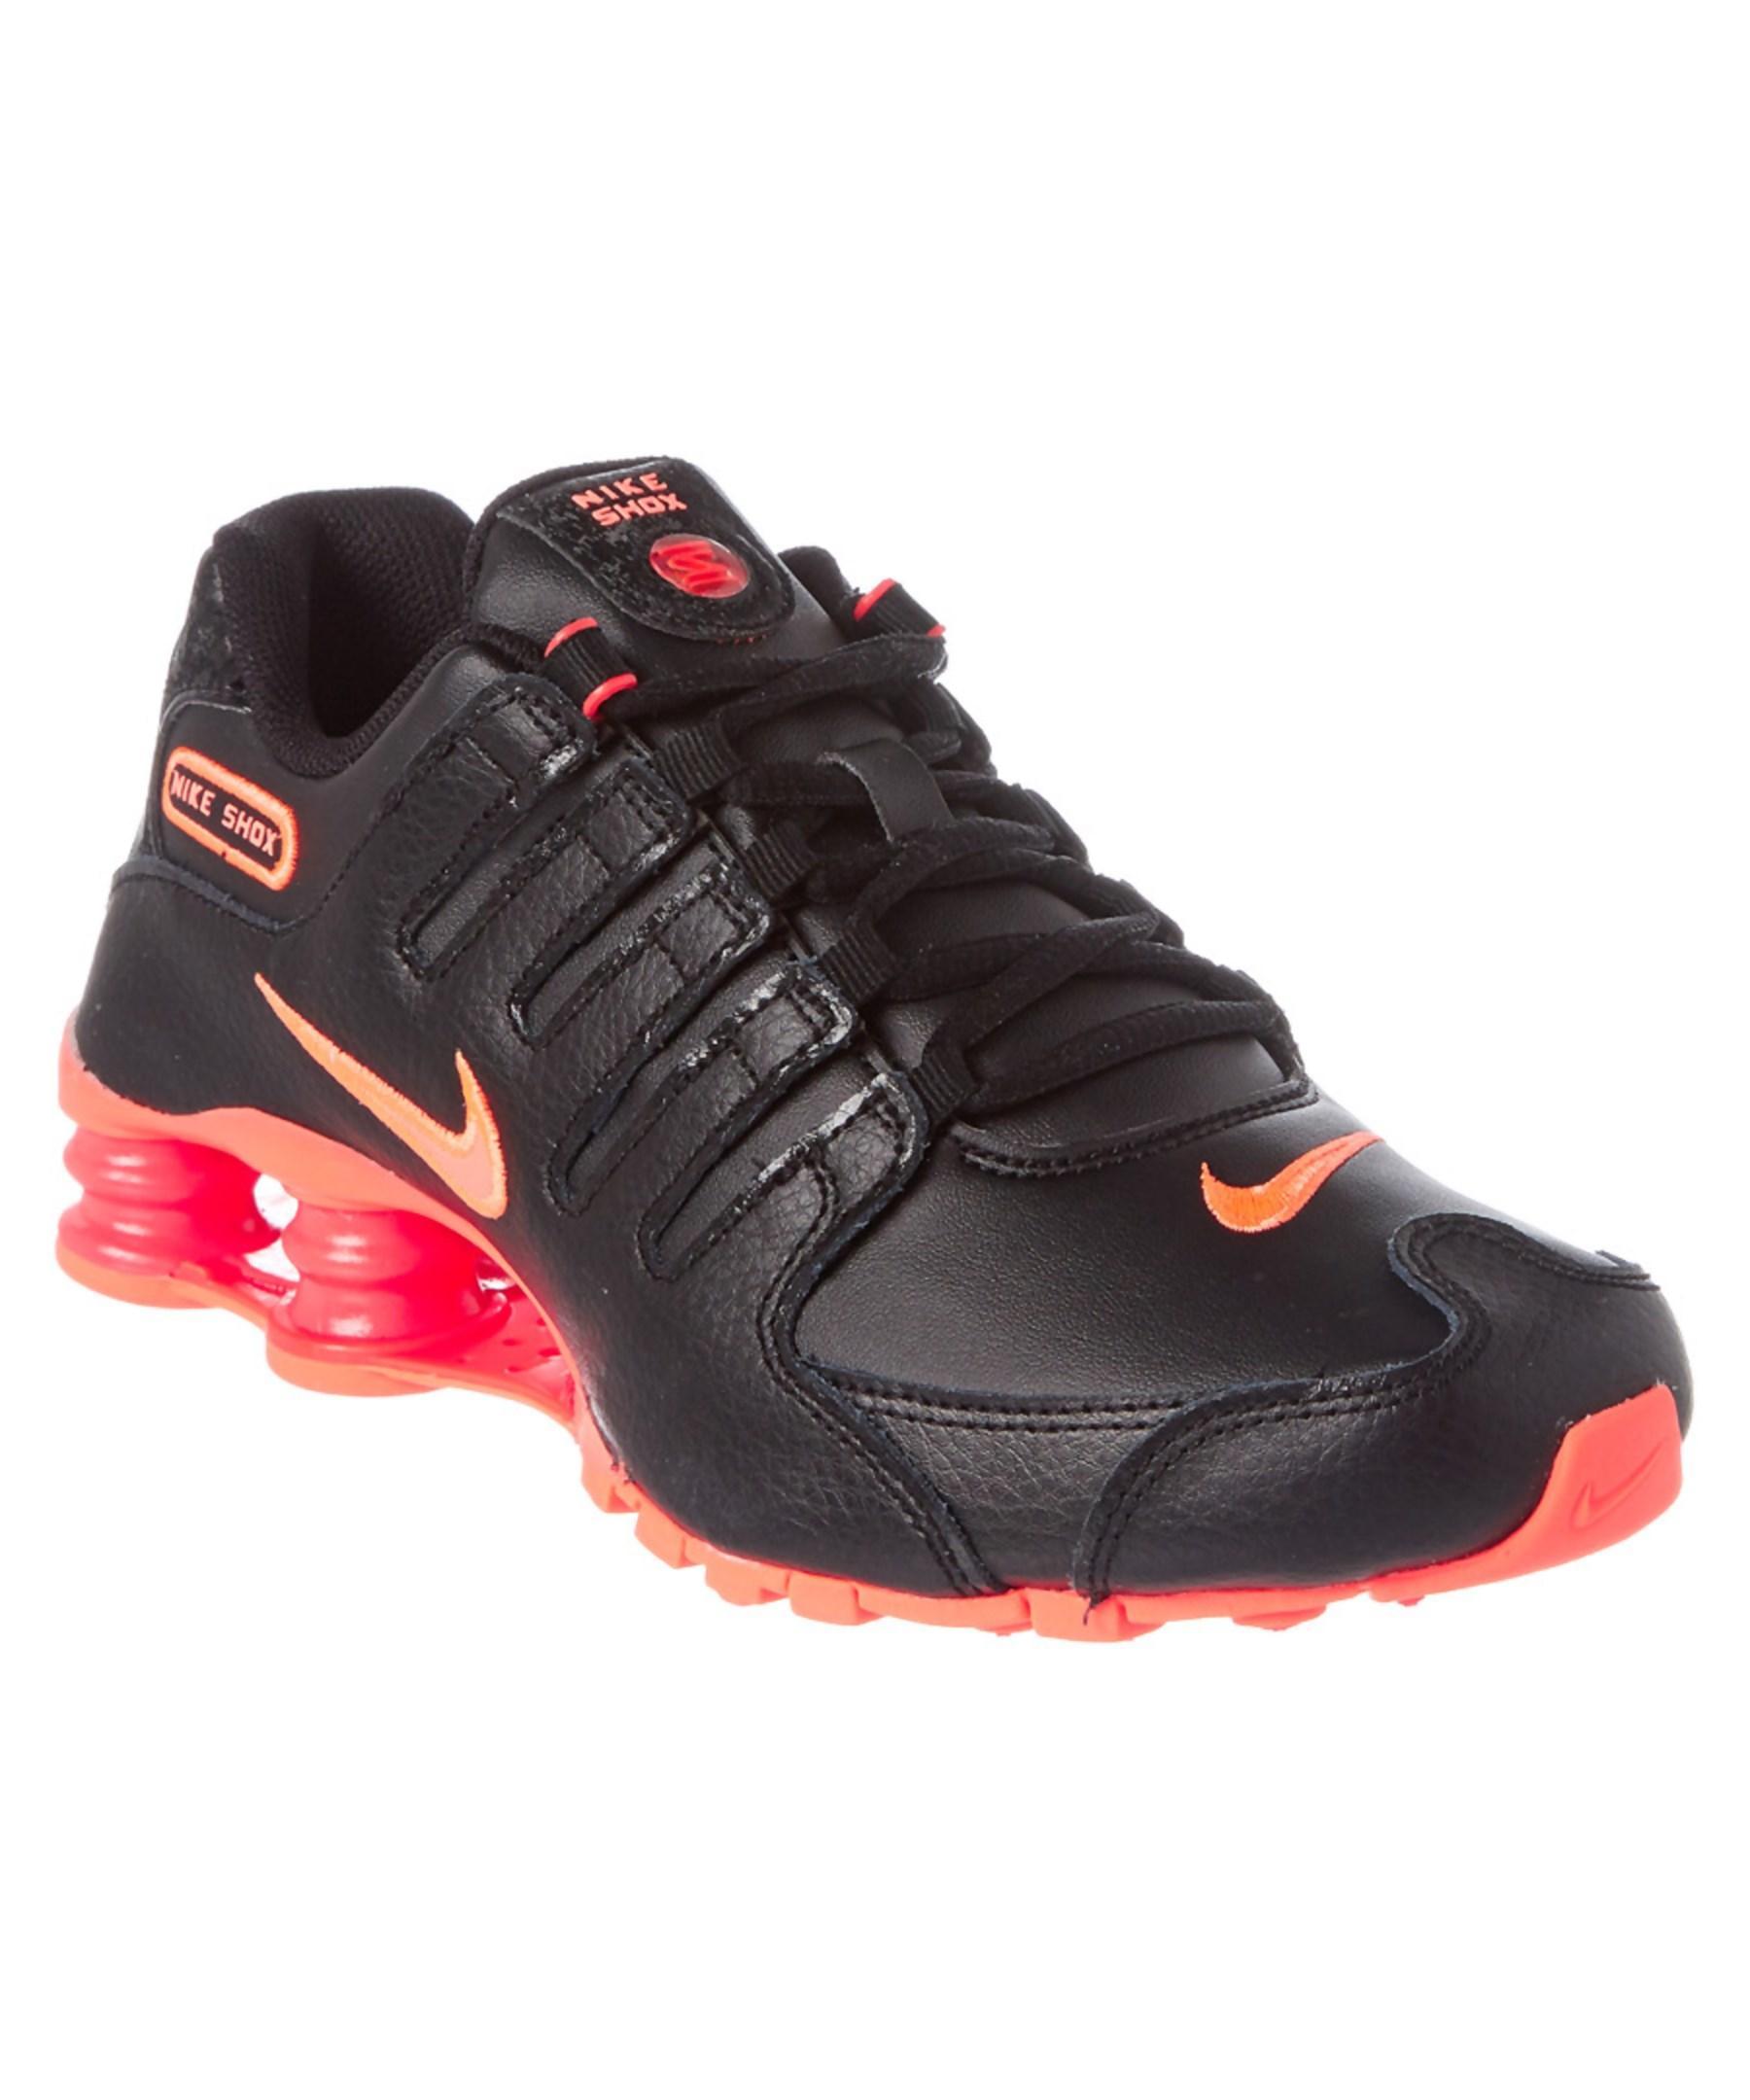 8b2f39843362 Lyst - Nike Women s Shox Nz Eu Leather Running Shoe in Black